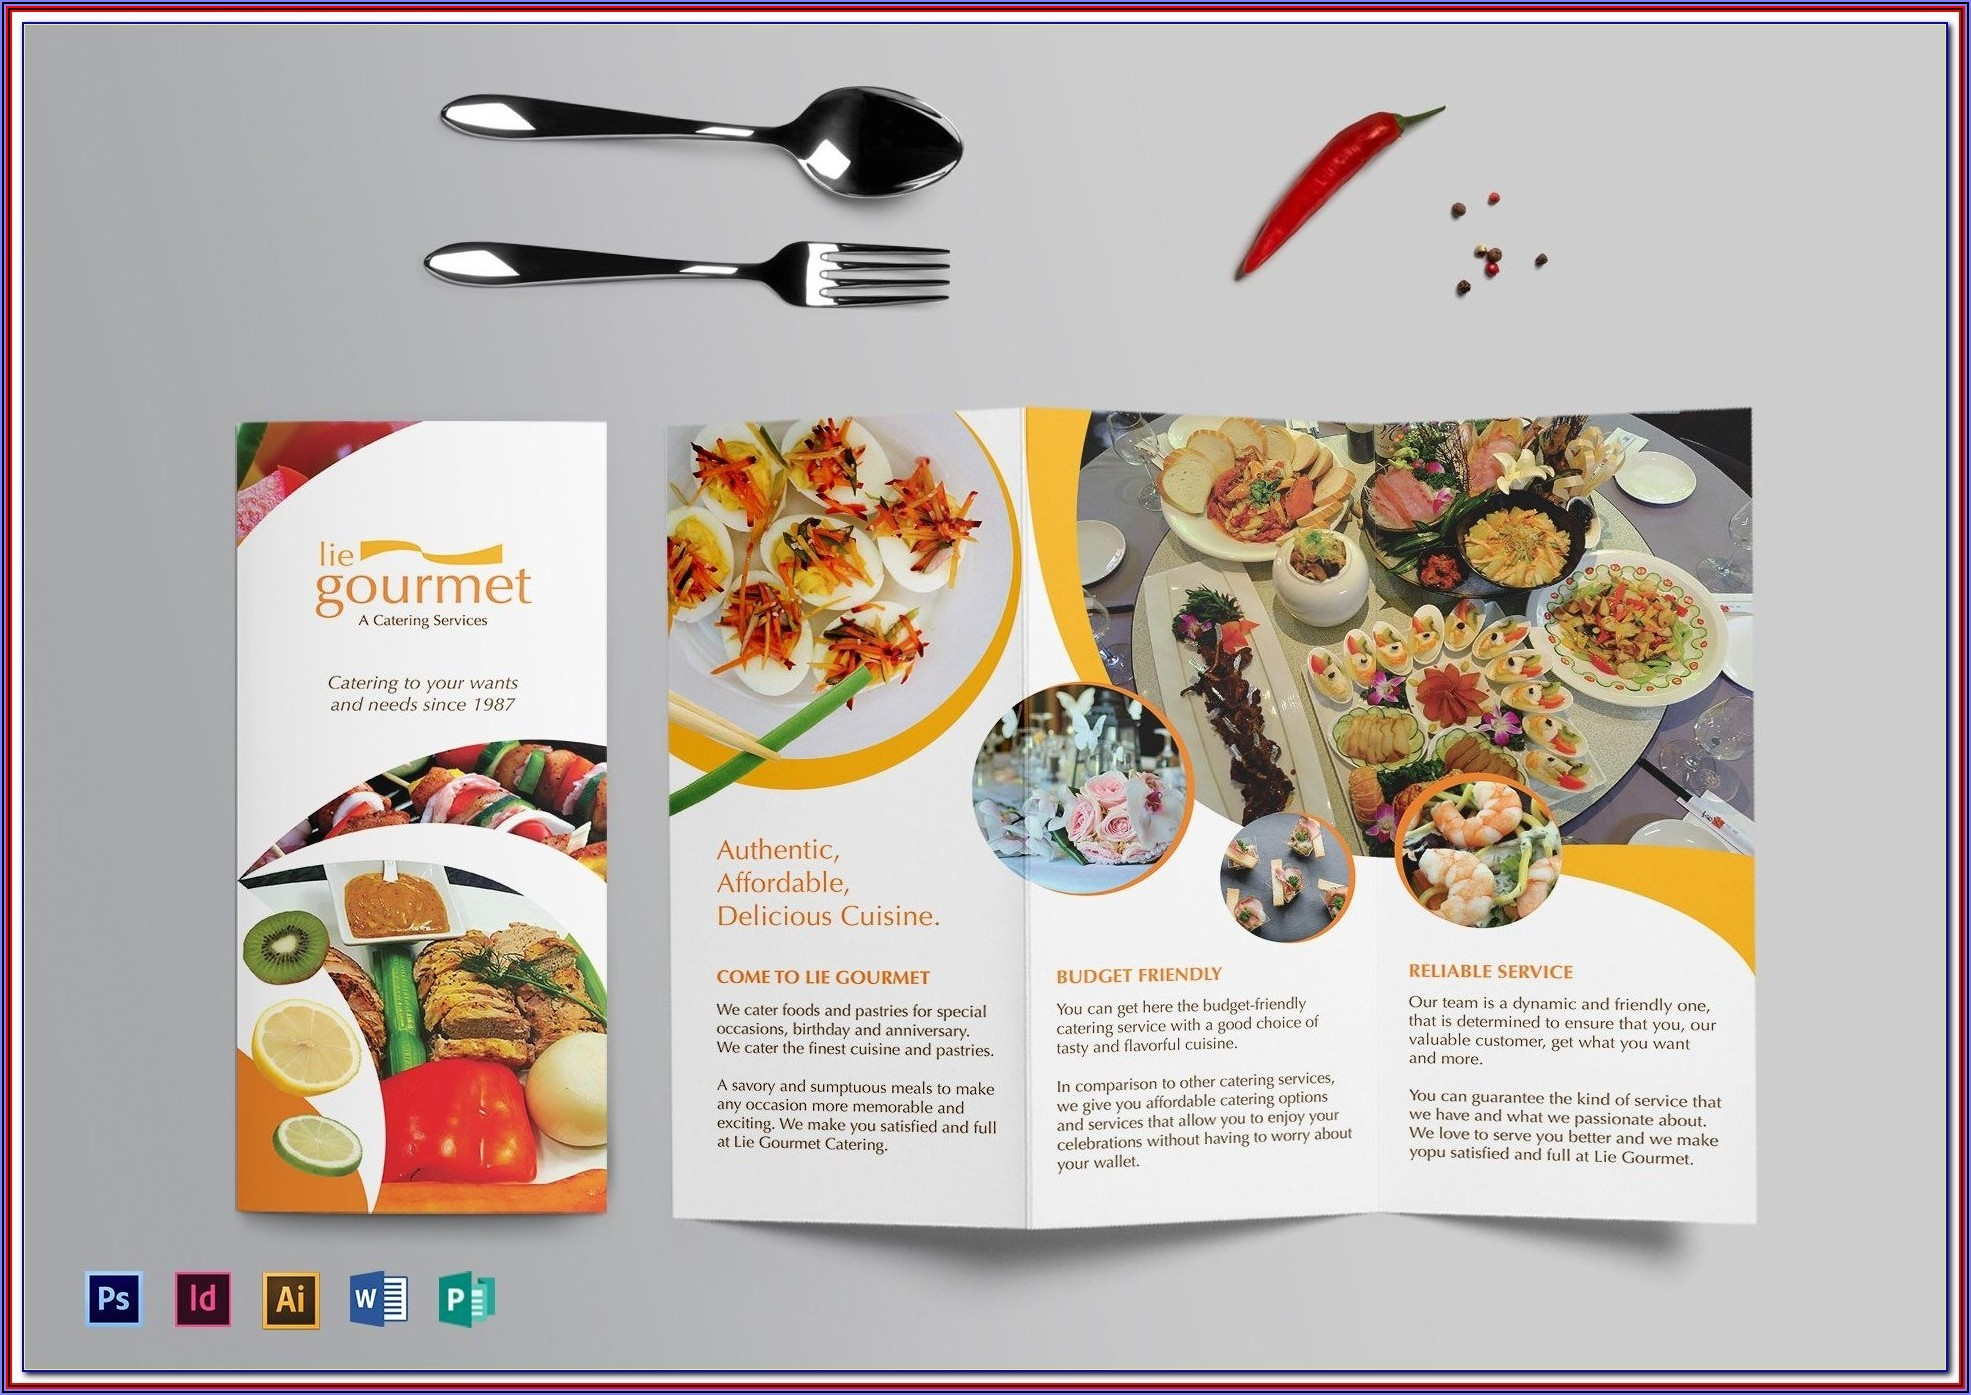 Restaurant Food Cost Excel Templates